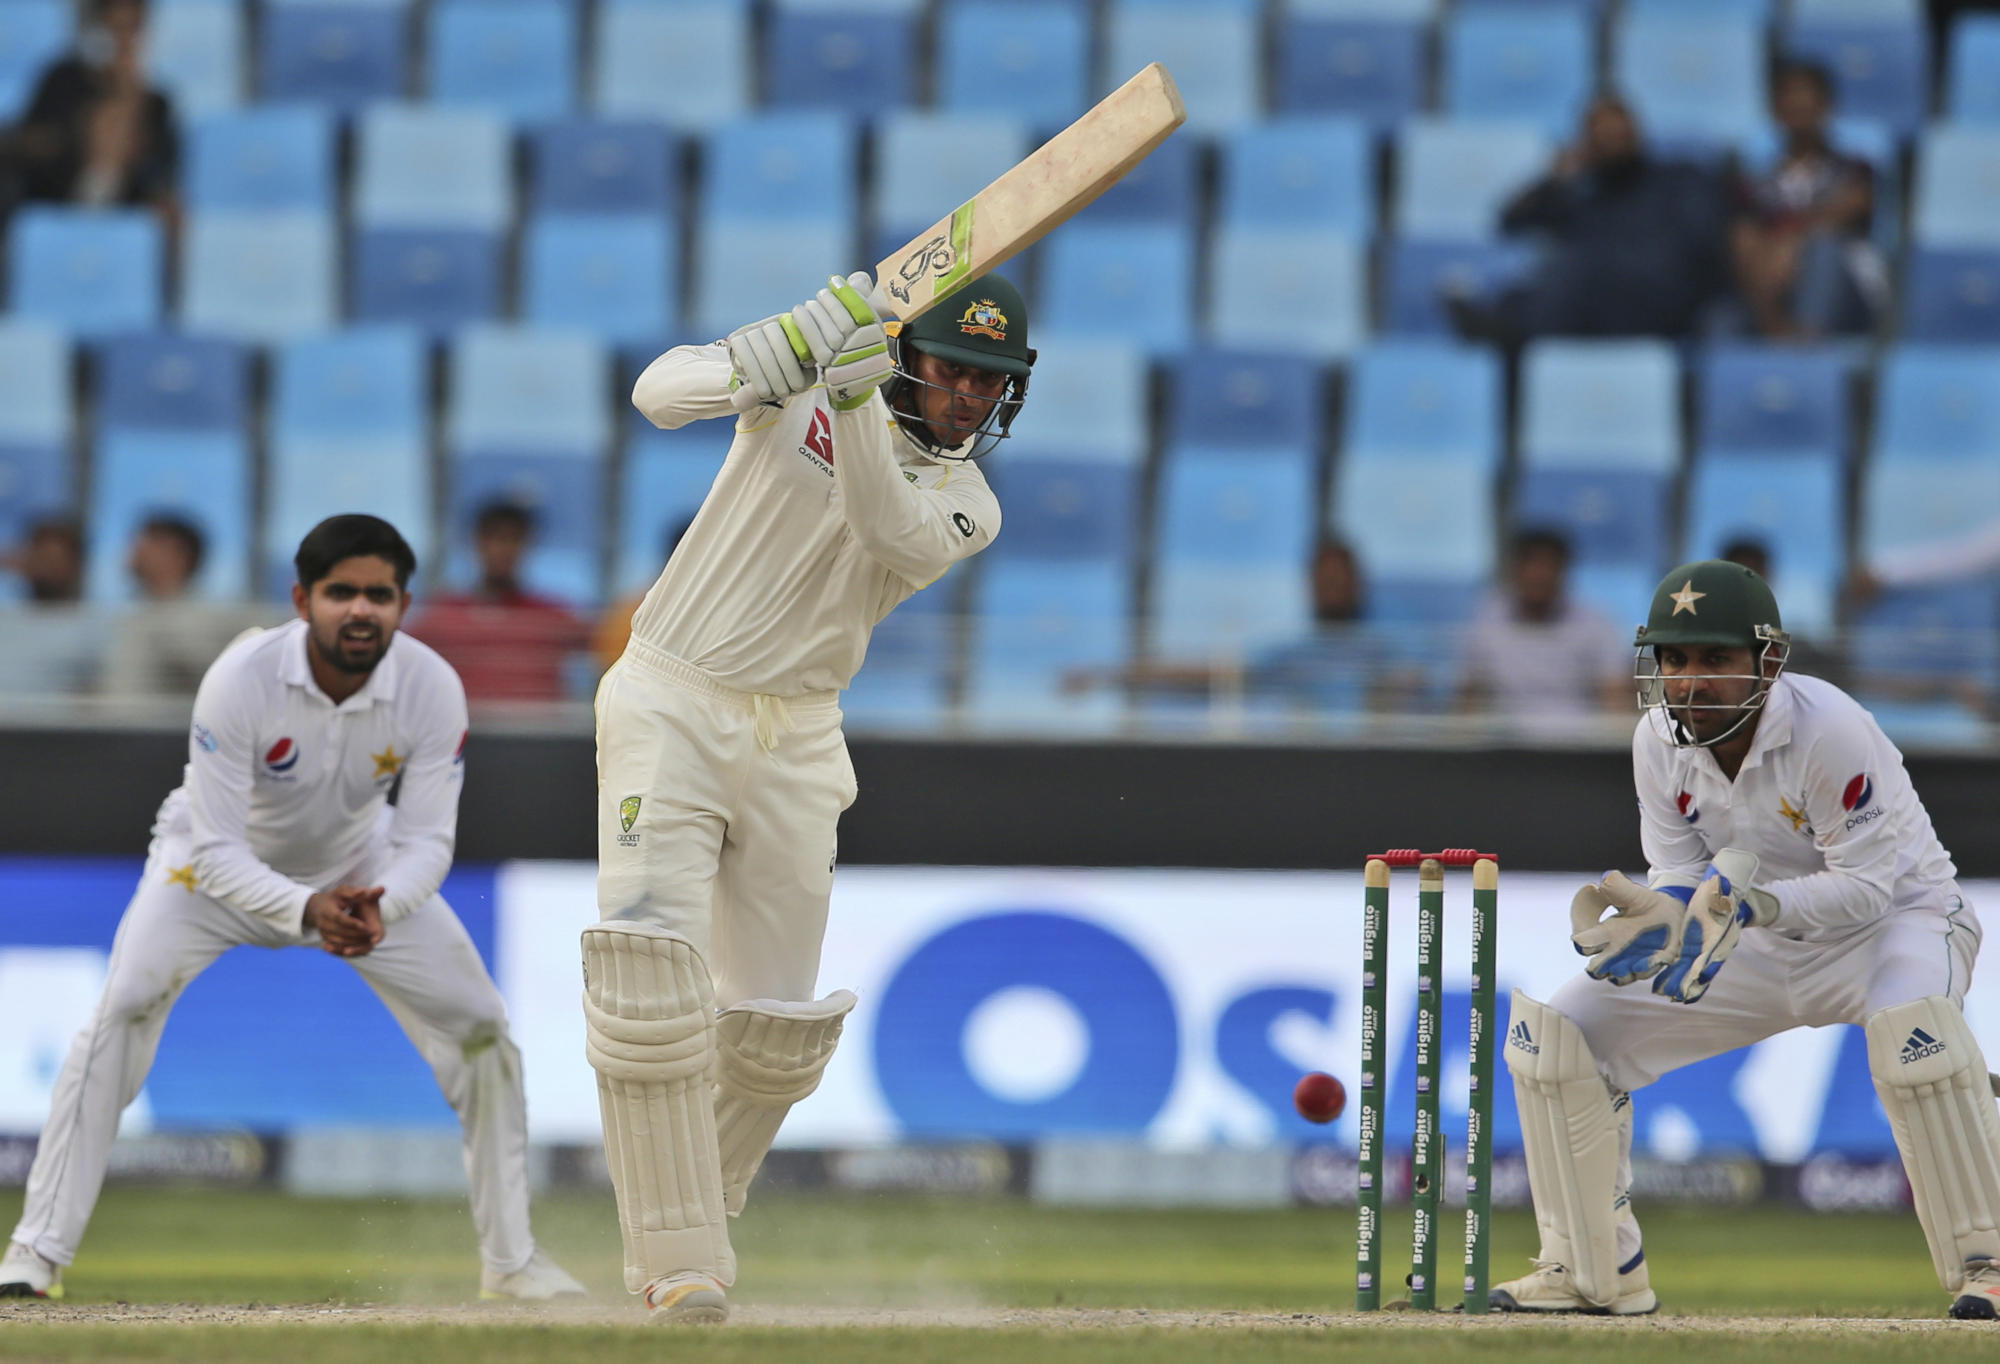 Usman Khawaja plays a shot against Pakistan